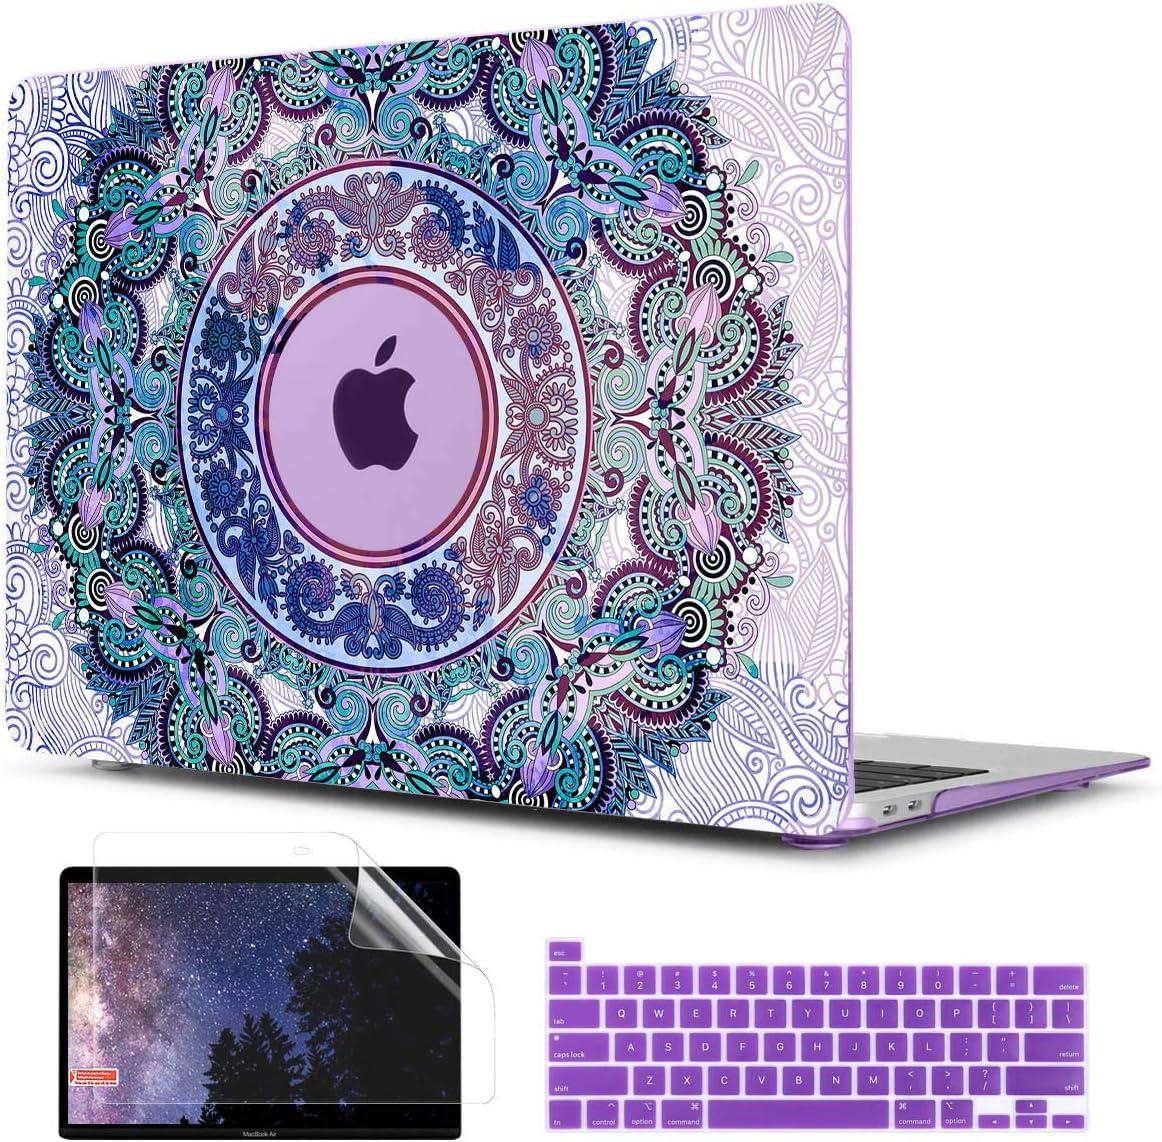 TwoL Purple Mandala Hard Shell Case Keyboard Skin Screen Protector for New MacBook Pro 13 inch 2020 Model A2251 A2289